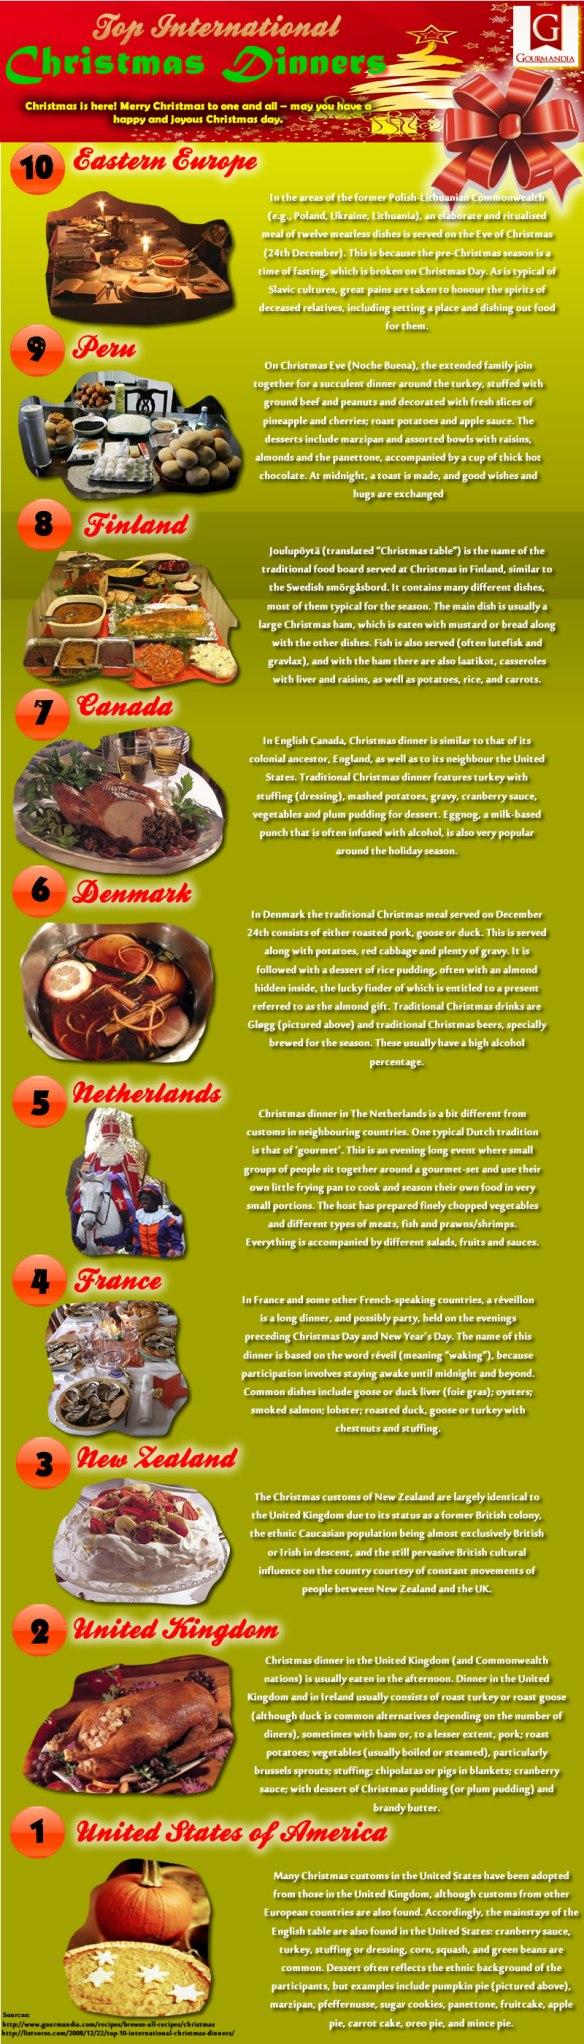 top-christmas-dinners_52a296d6b8cf6